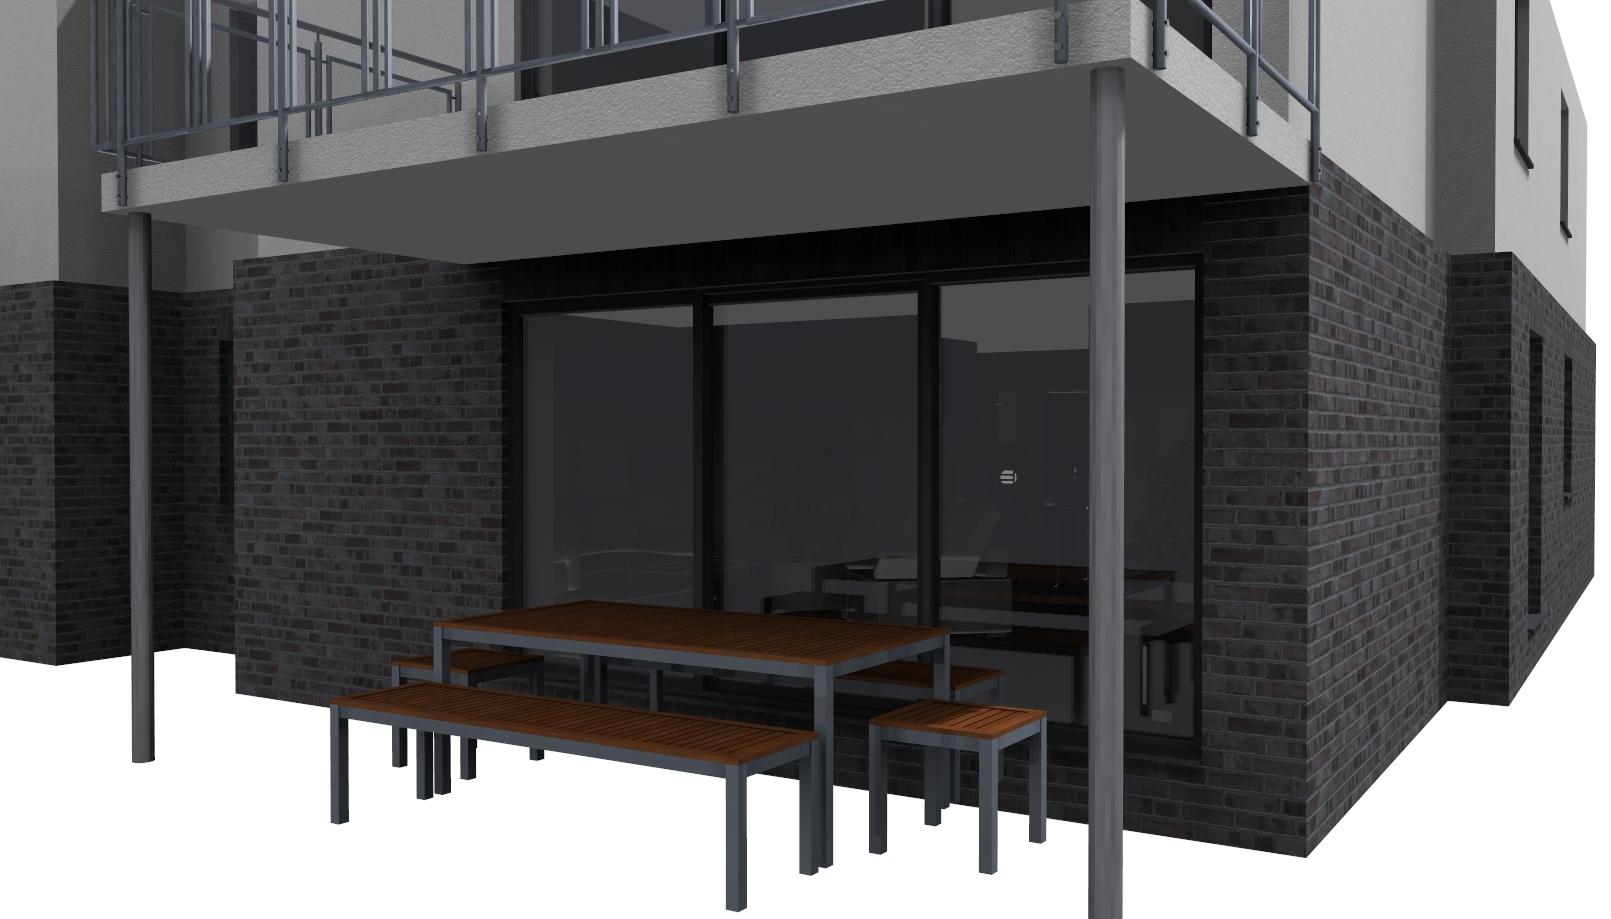 Terrassenansicht_3D